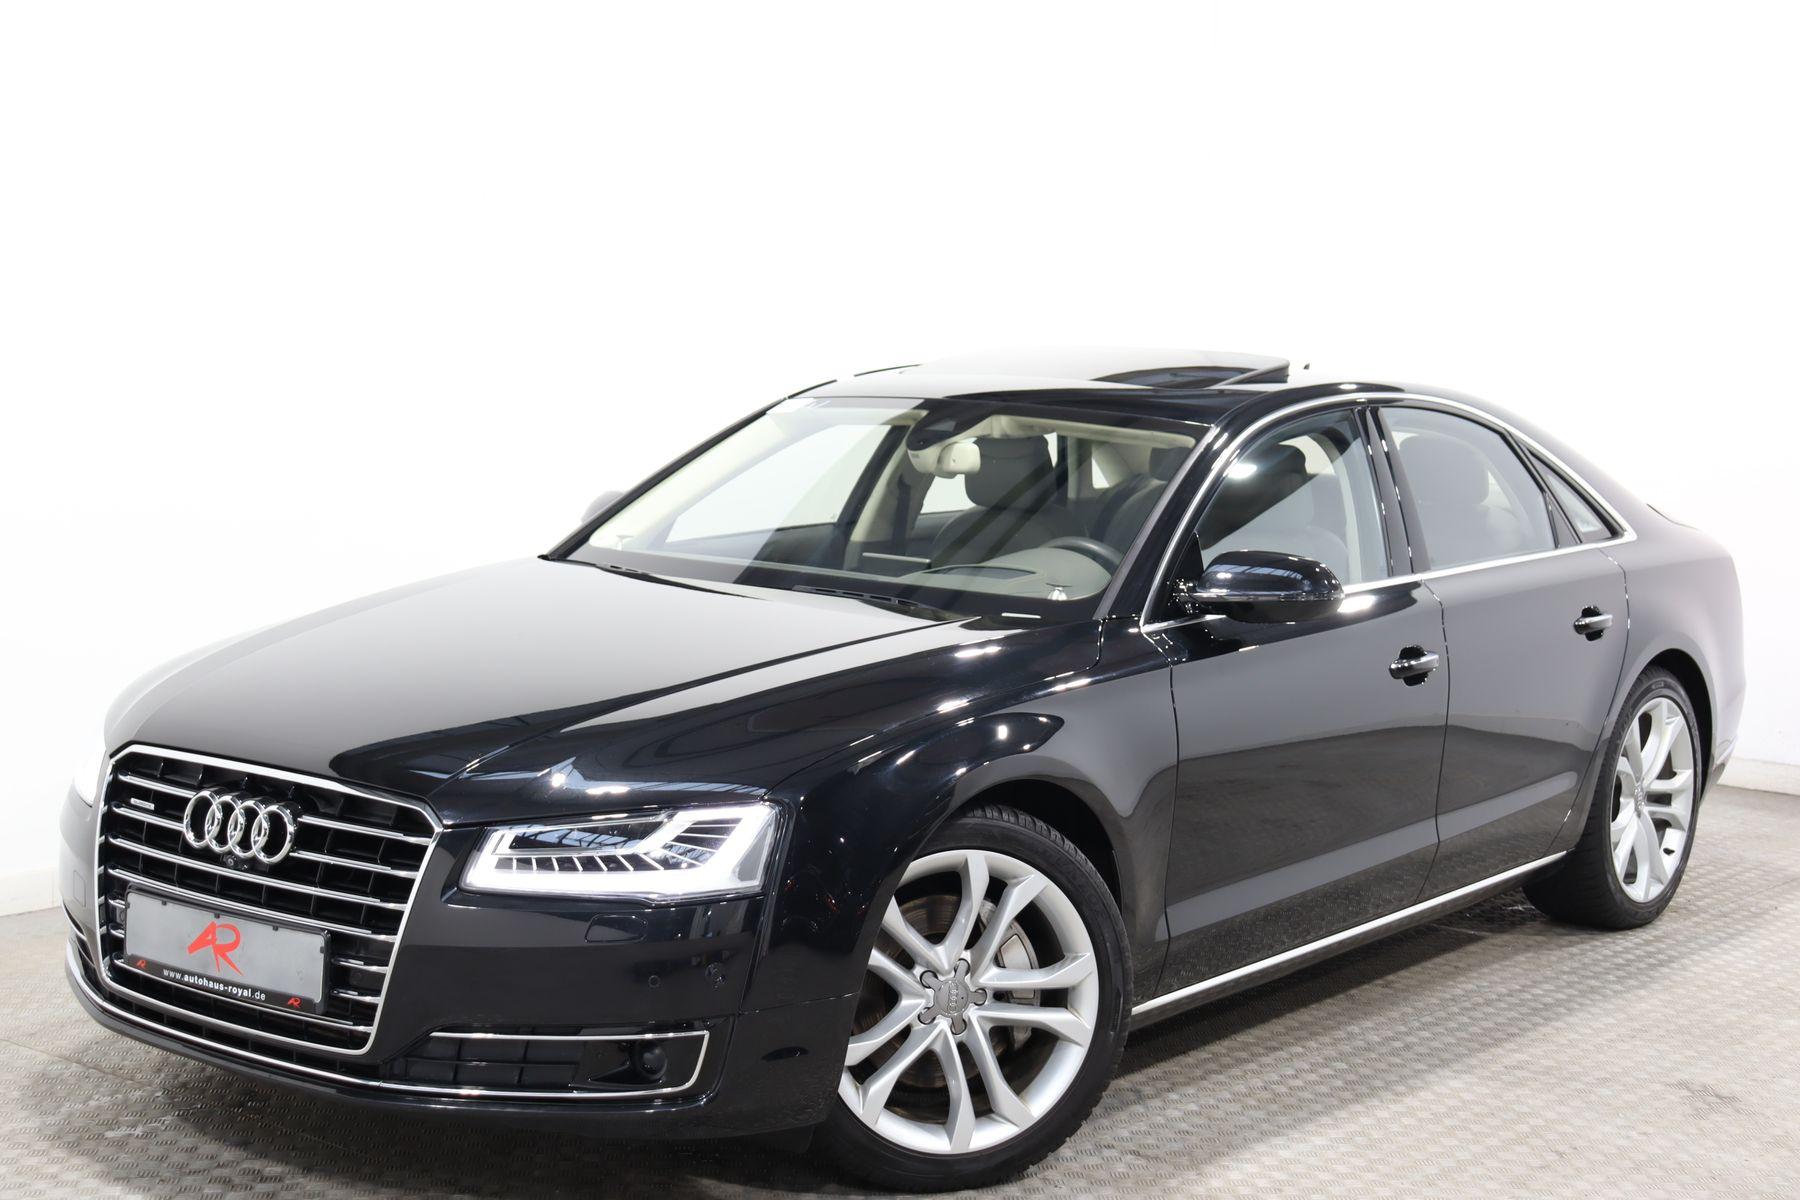 Audi A8 3.0 TDI qu DESIGN SELECTION BANG+O HIGH END, Jahr 2015, Diesel